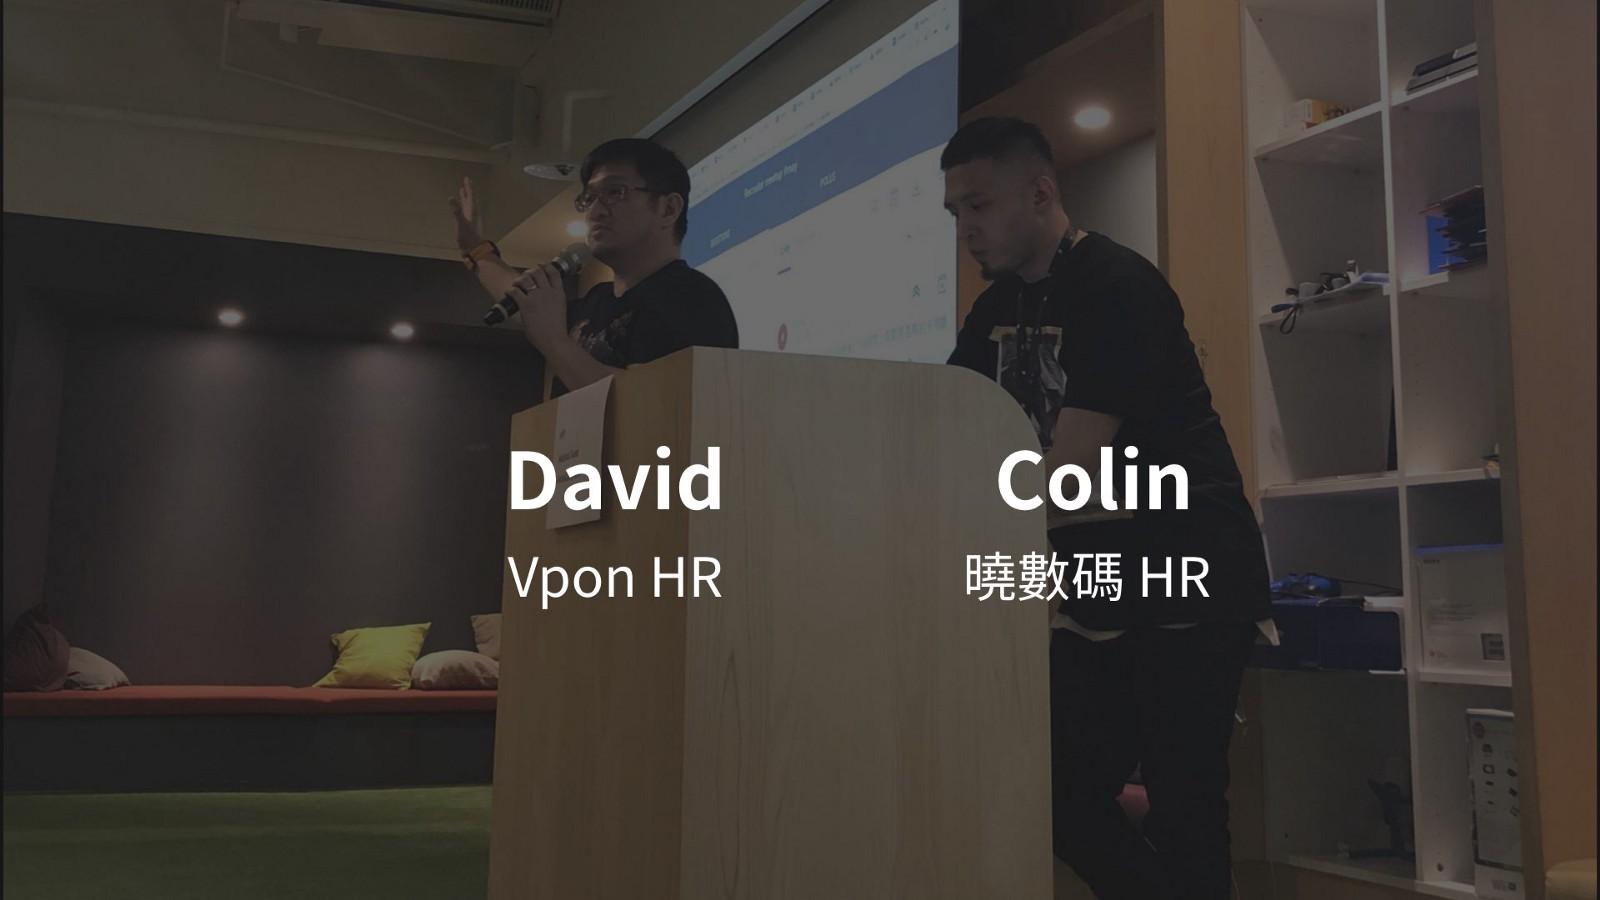 Vpon 威朋 David 哥,曉數碼 HR Colin 無私分享人才招募心得、跨國團隊管理、企業文化塑造